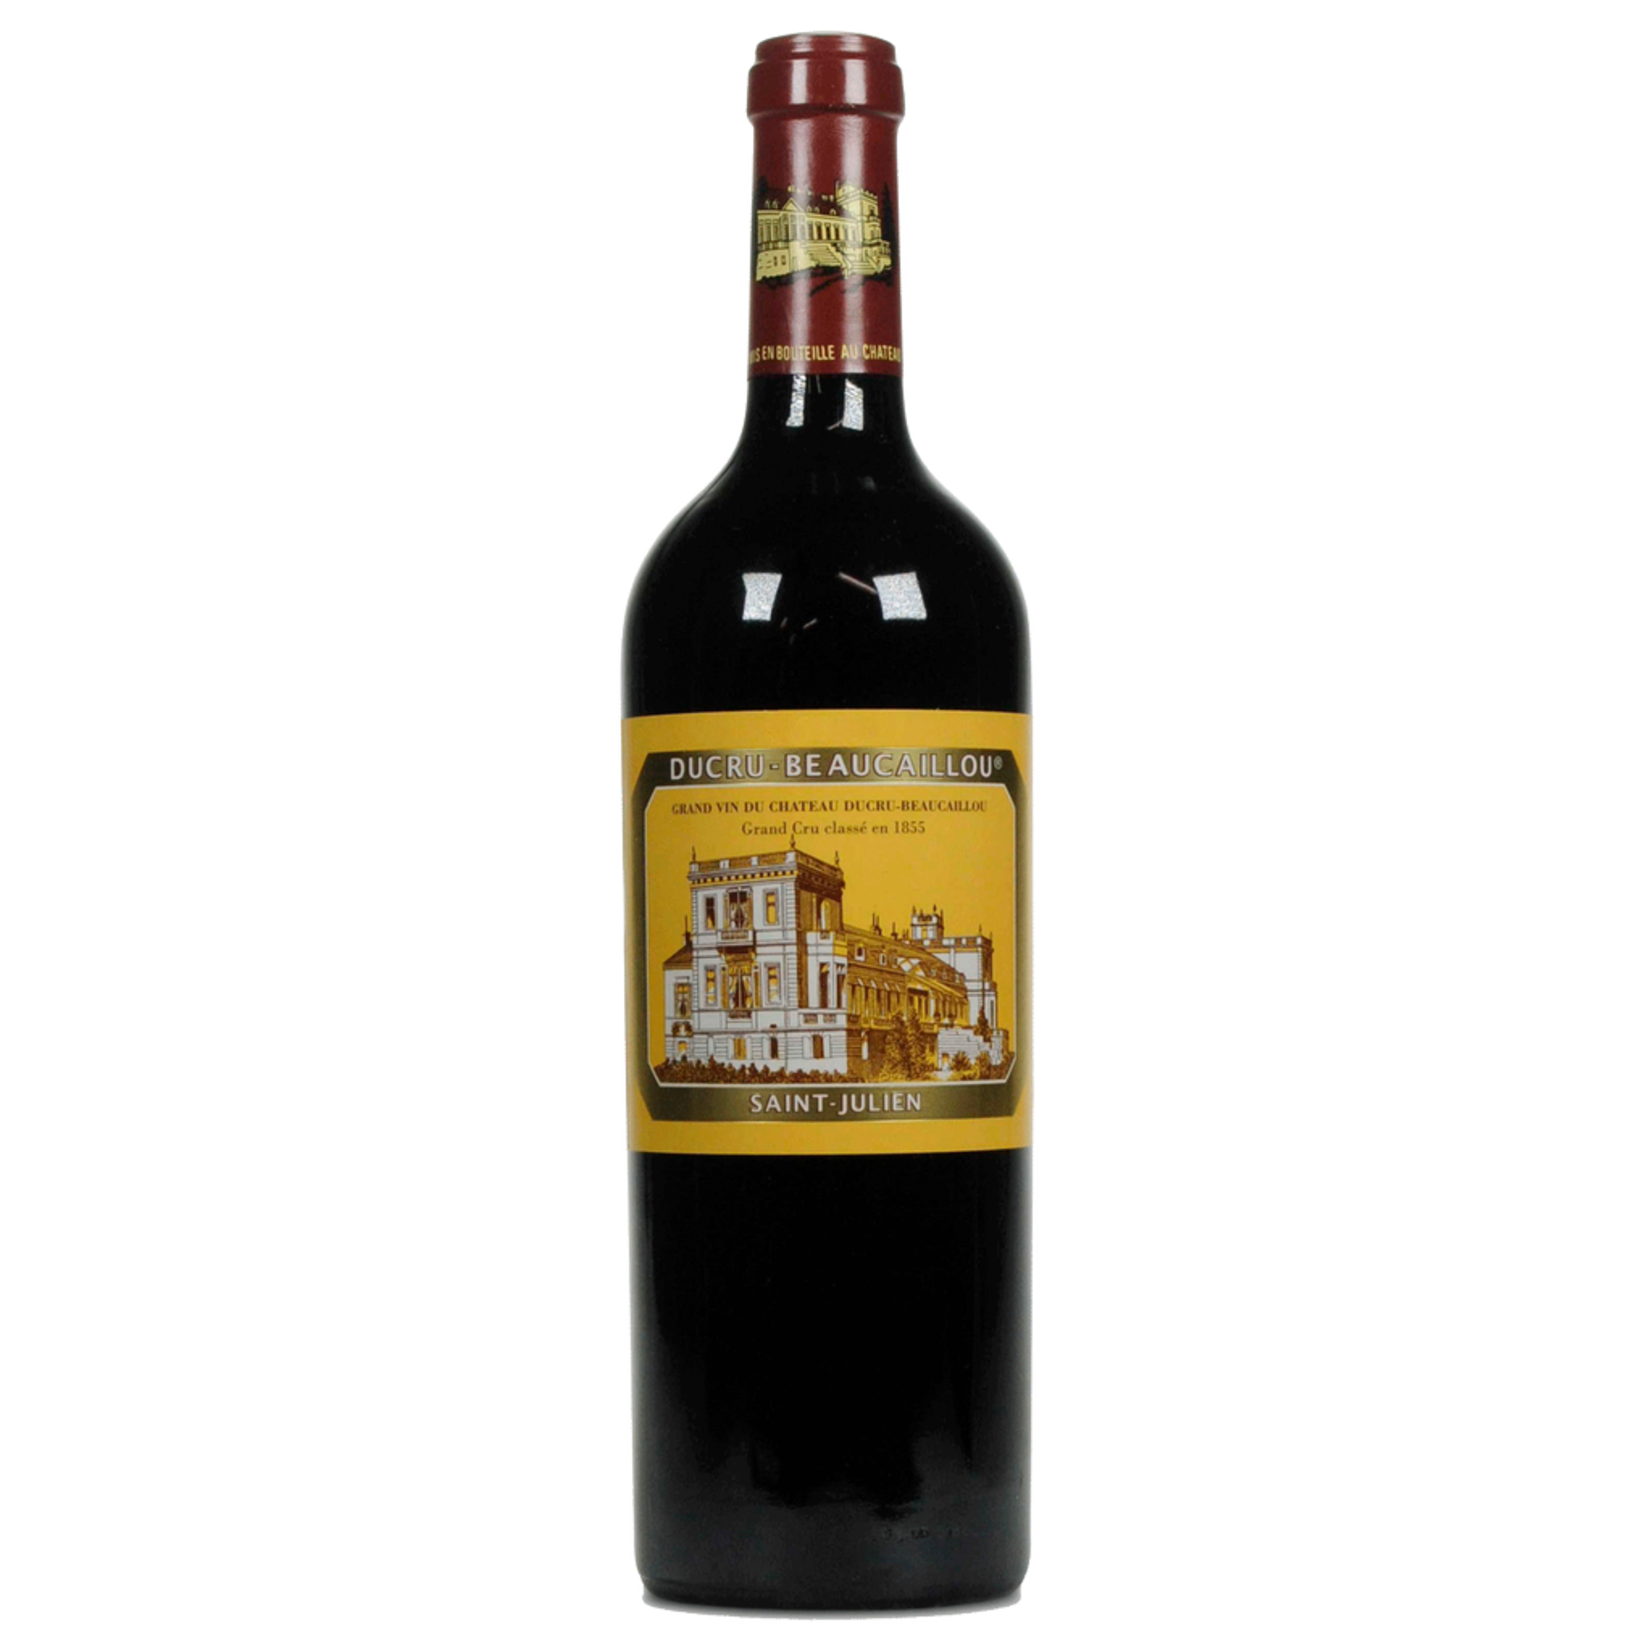 Wine Chateau Ducru Beaucaillou 1988